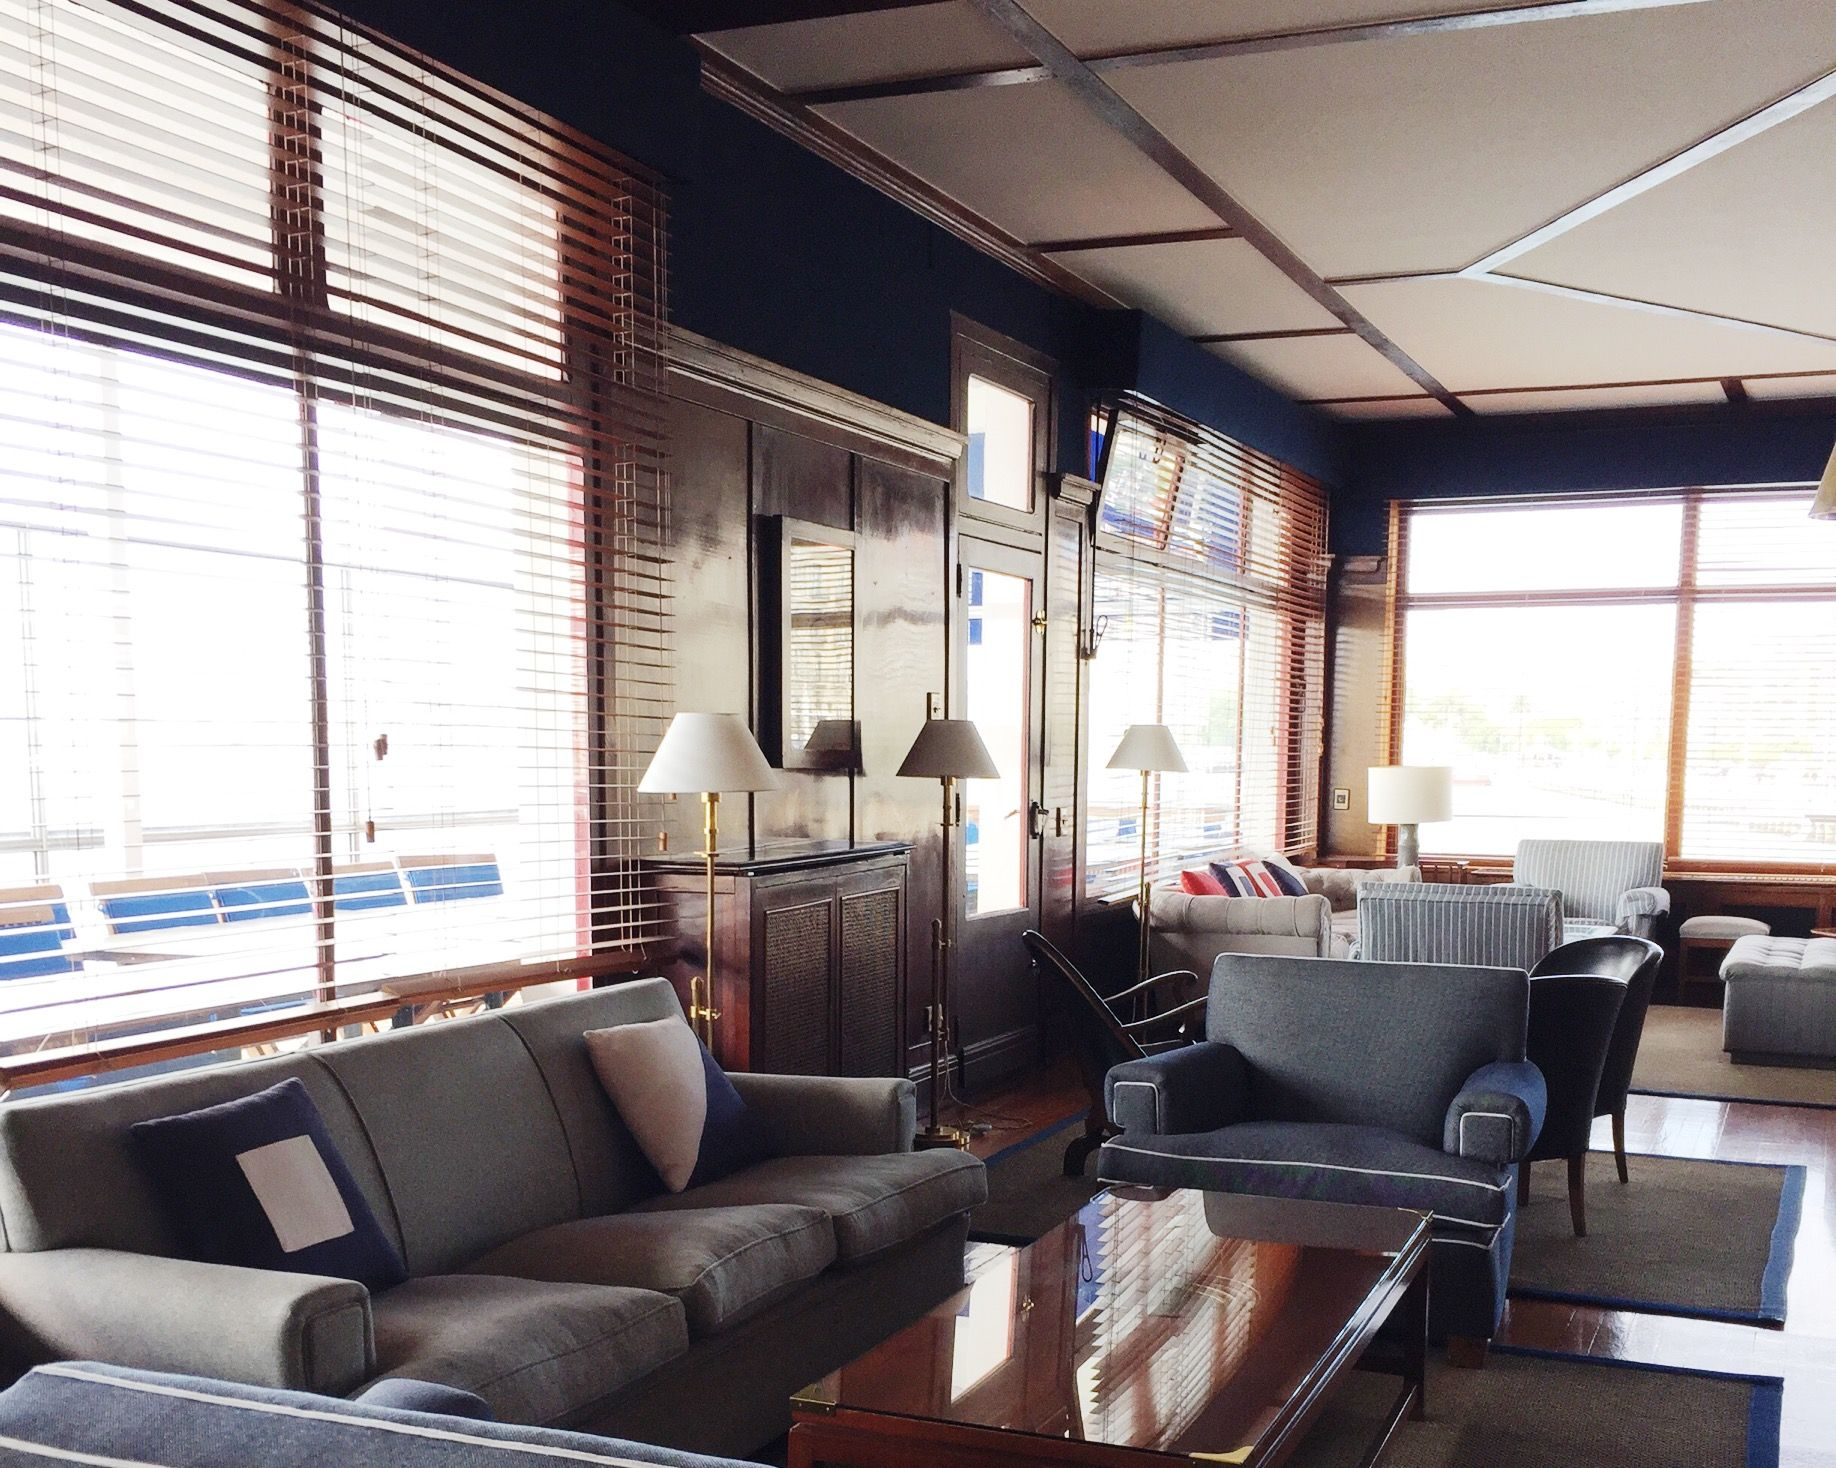 #studio #garden #housedecoration #interiorprojects #homeandcontract #homeandgarden #interiordesigner #interiorstyle #homeandcontract #homedecor #lamouche #lamouchefurniture #santander #sailingclub